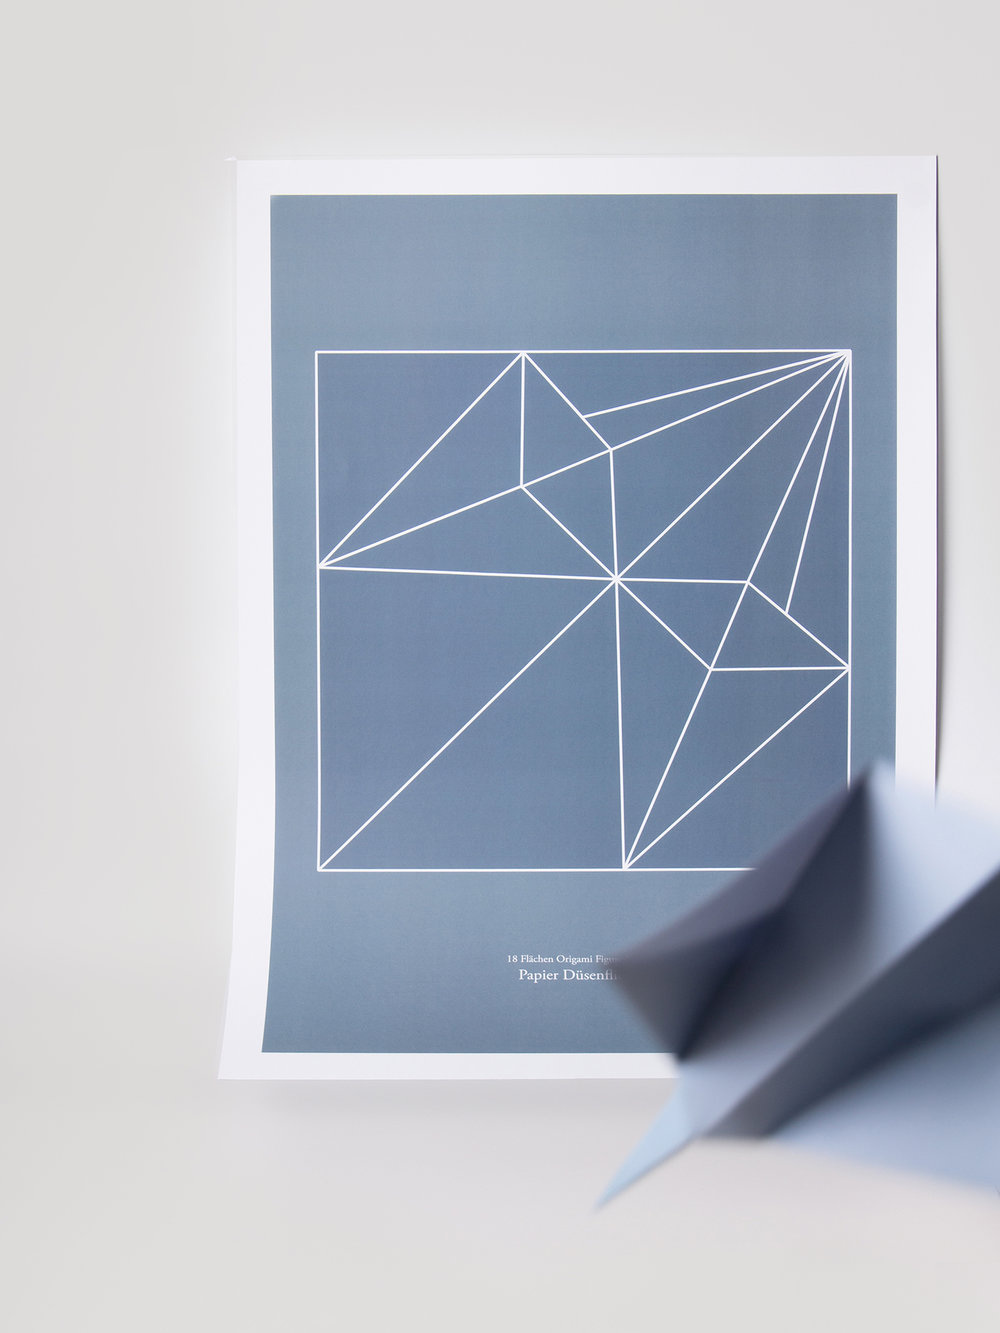 Origami Figur Papierdüsenflieger mit passendem Print  Origami figure Paperjet with adequate print